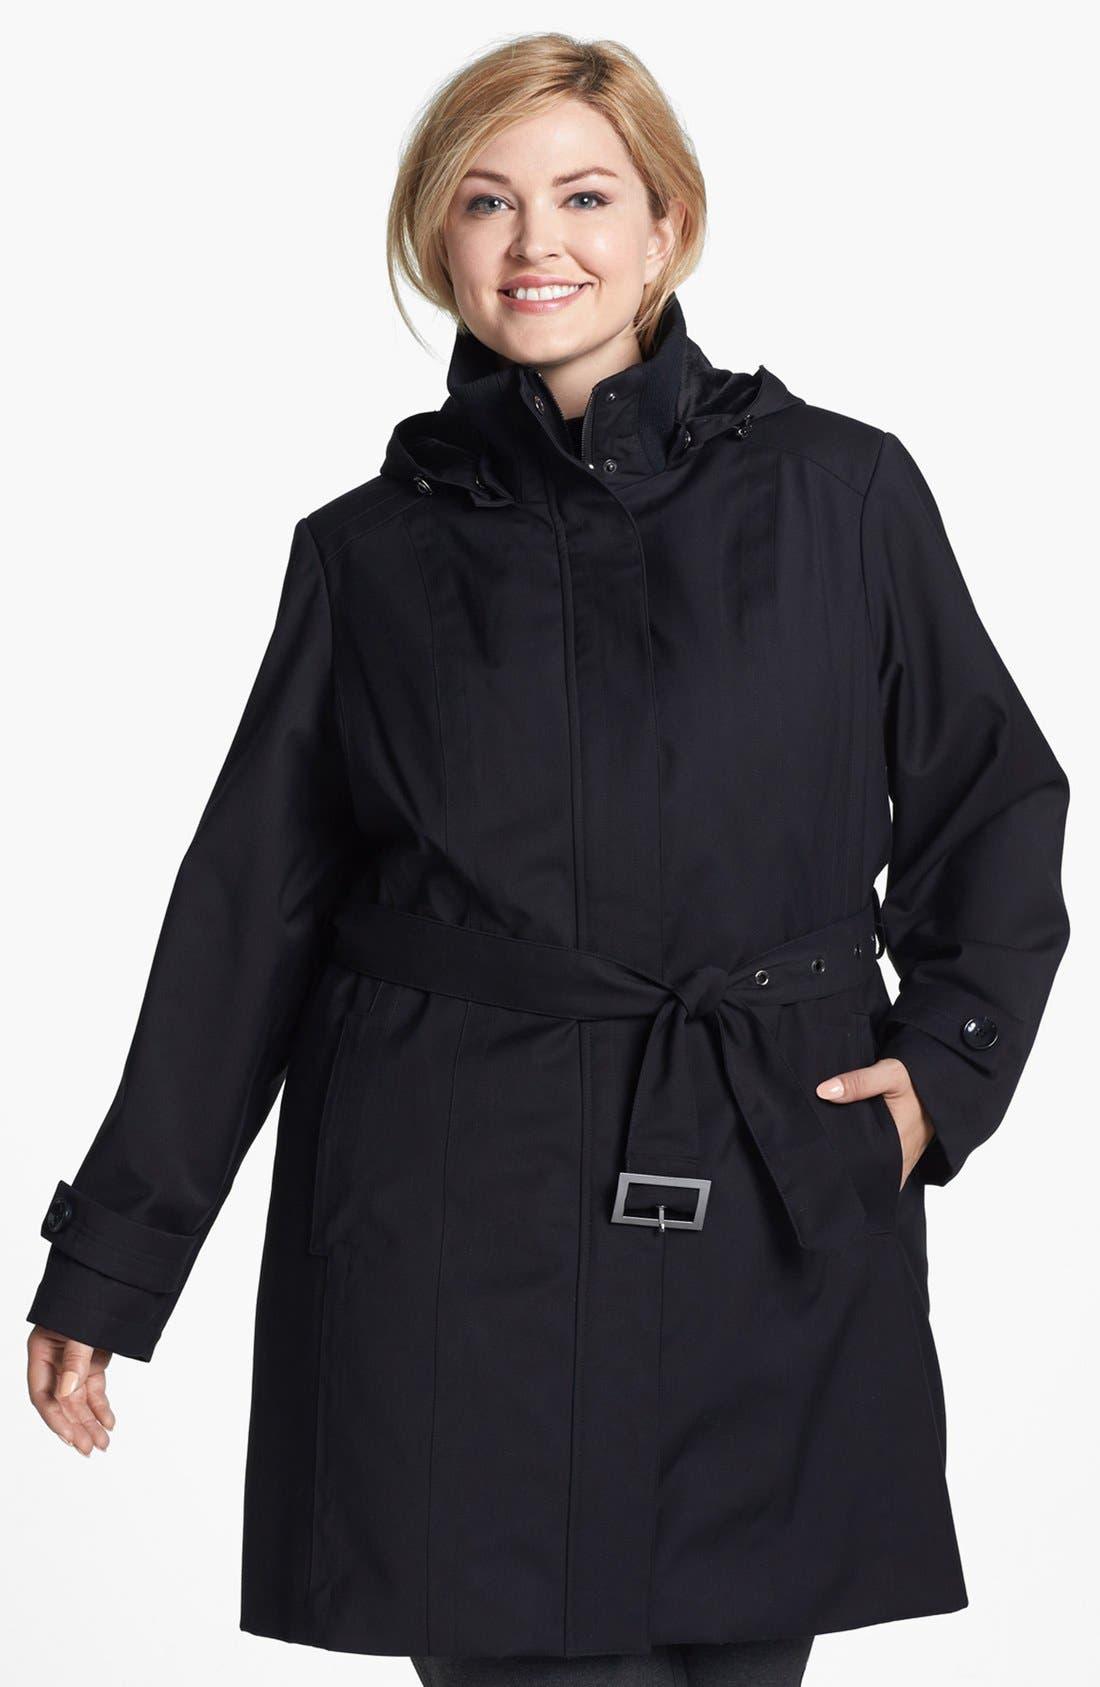 Alternate Image 1 Selected - Kristen Blake Knit Collar Raincoat with Detachable Hood & Liner (Plus Size)